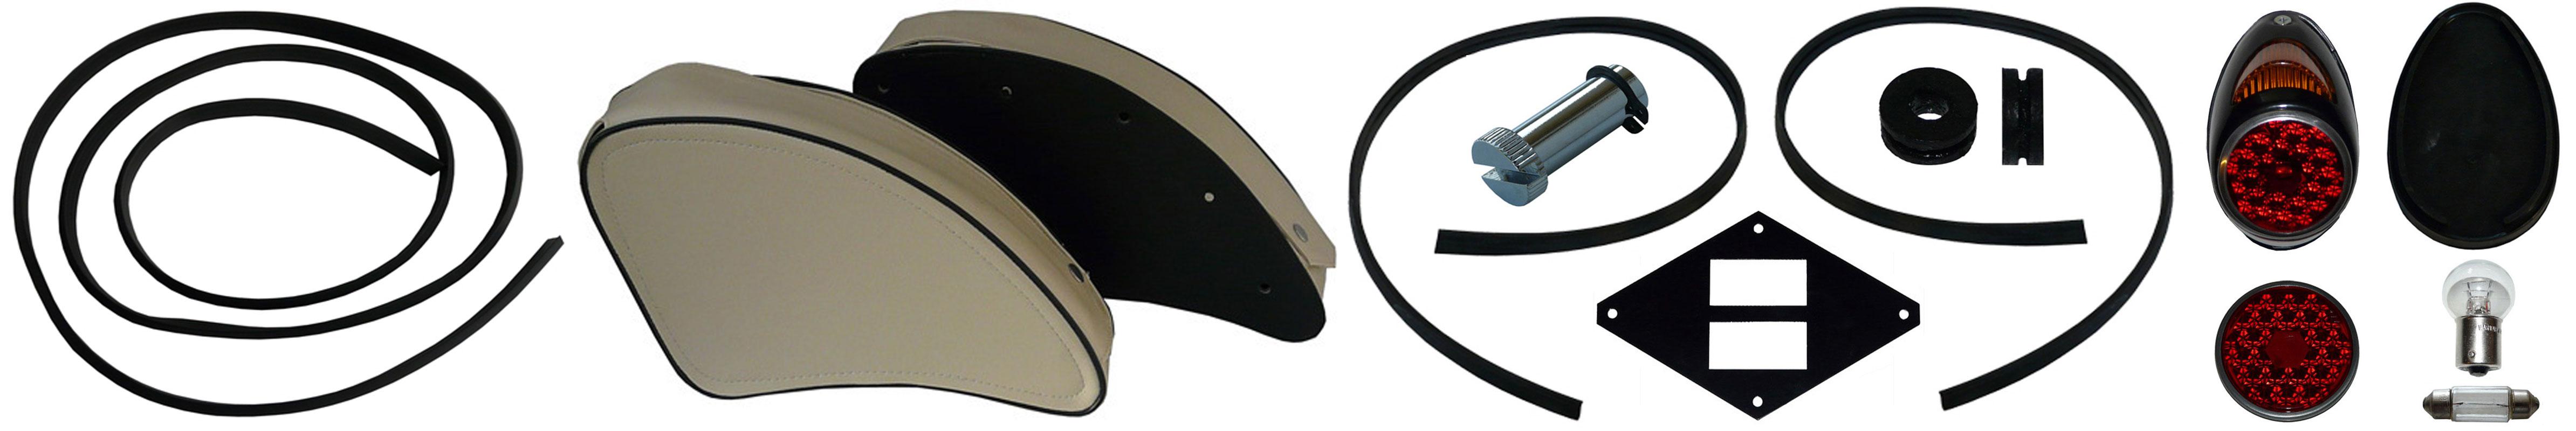 MZ ES 175/0 250/0 Ersatzteile Verkleidung Schutzblech Rücklicht